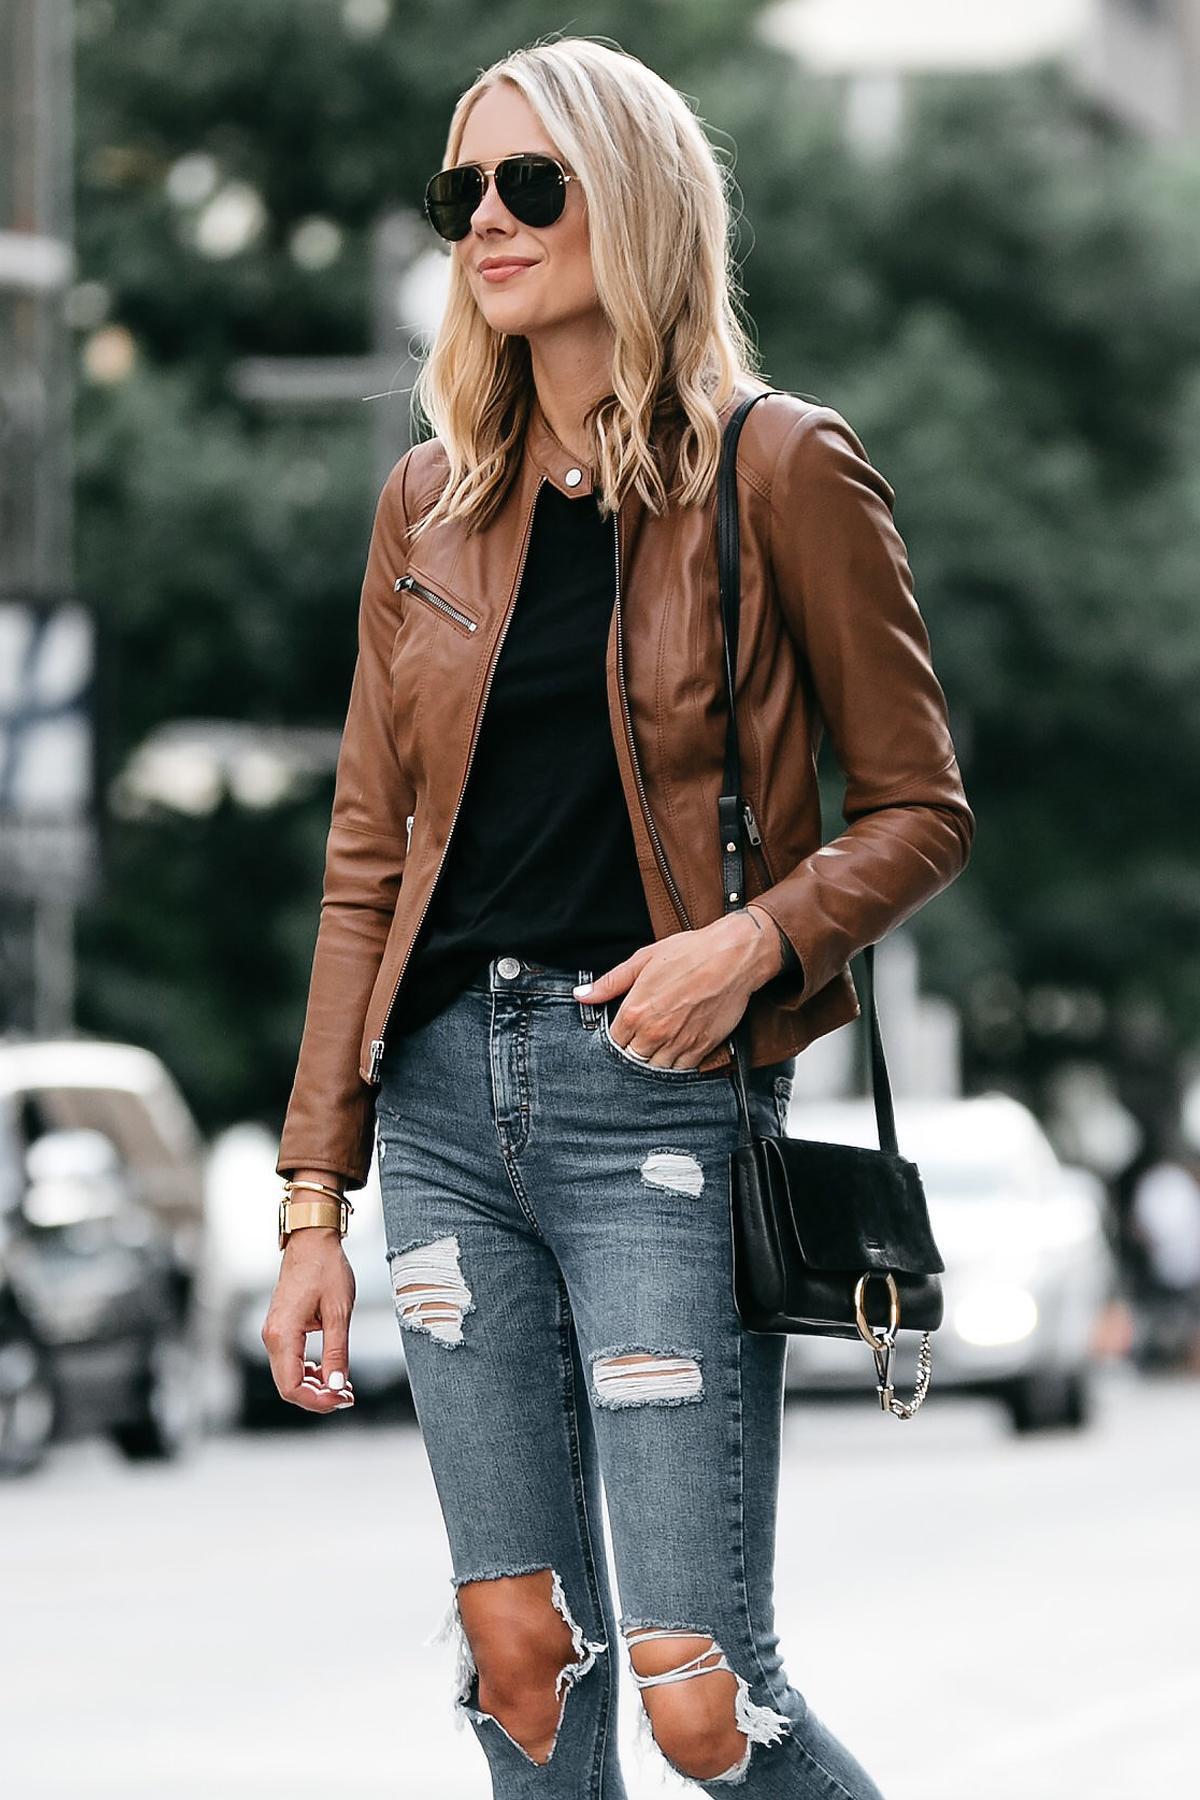 Blonde Woman Wearing Tan Leather Jacket Black Tshirt Denim Ripped Skinny Jeans Outfit Chloe Faye Handbag Fashion Jackson Dallas Blogger Fashion Blogger Street Style